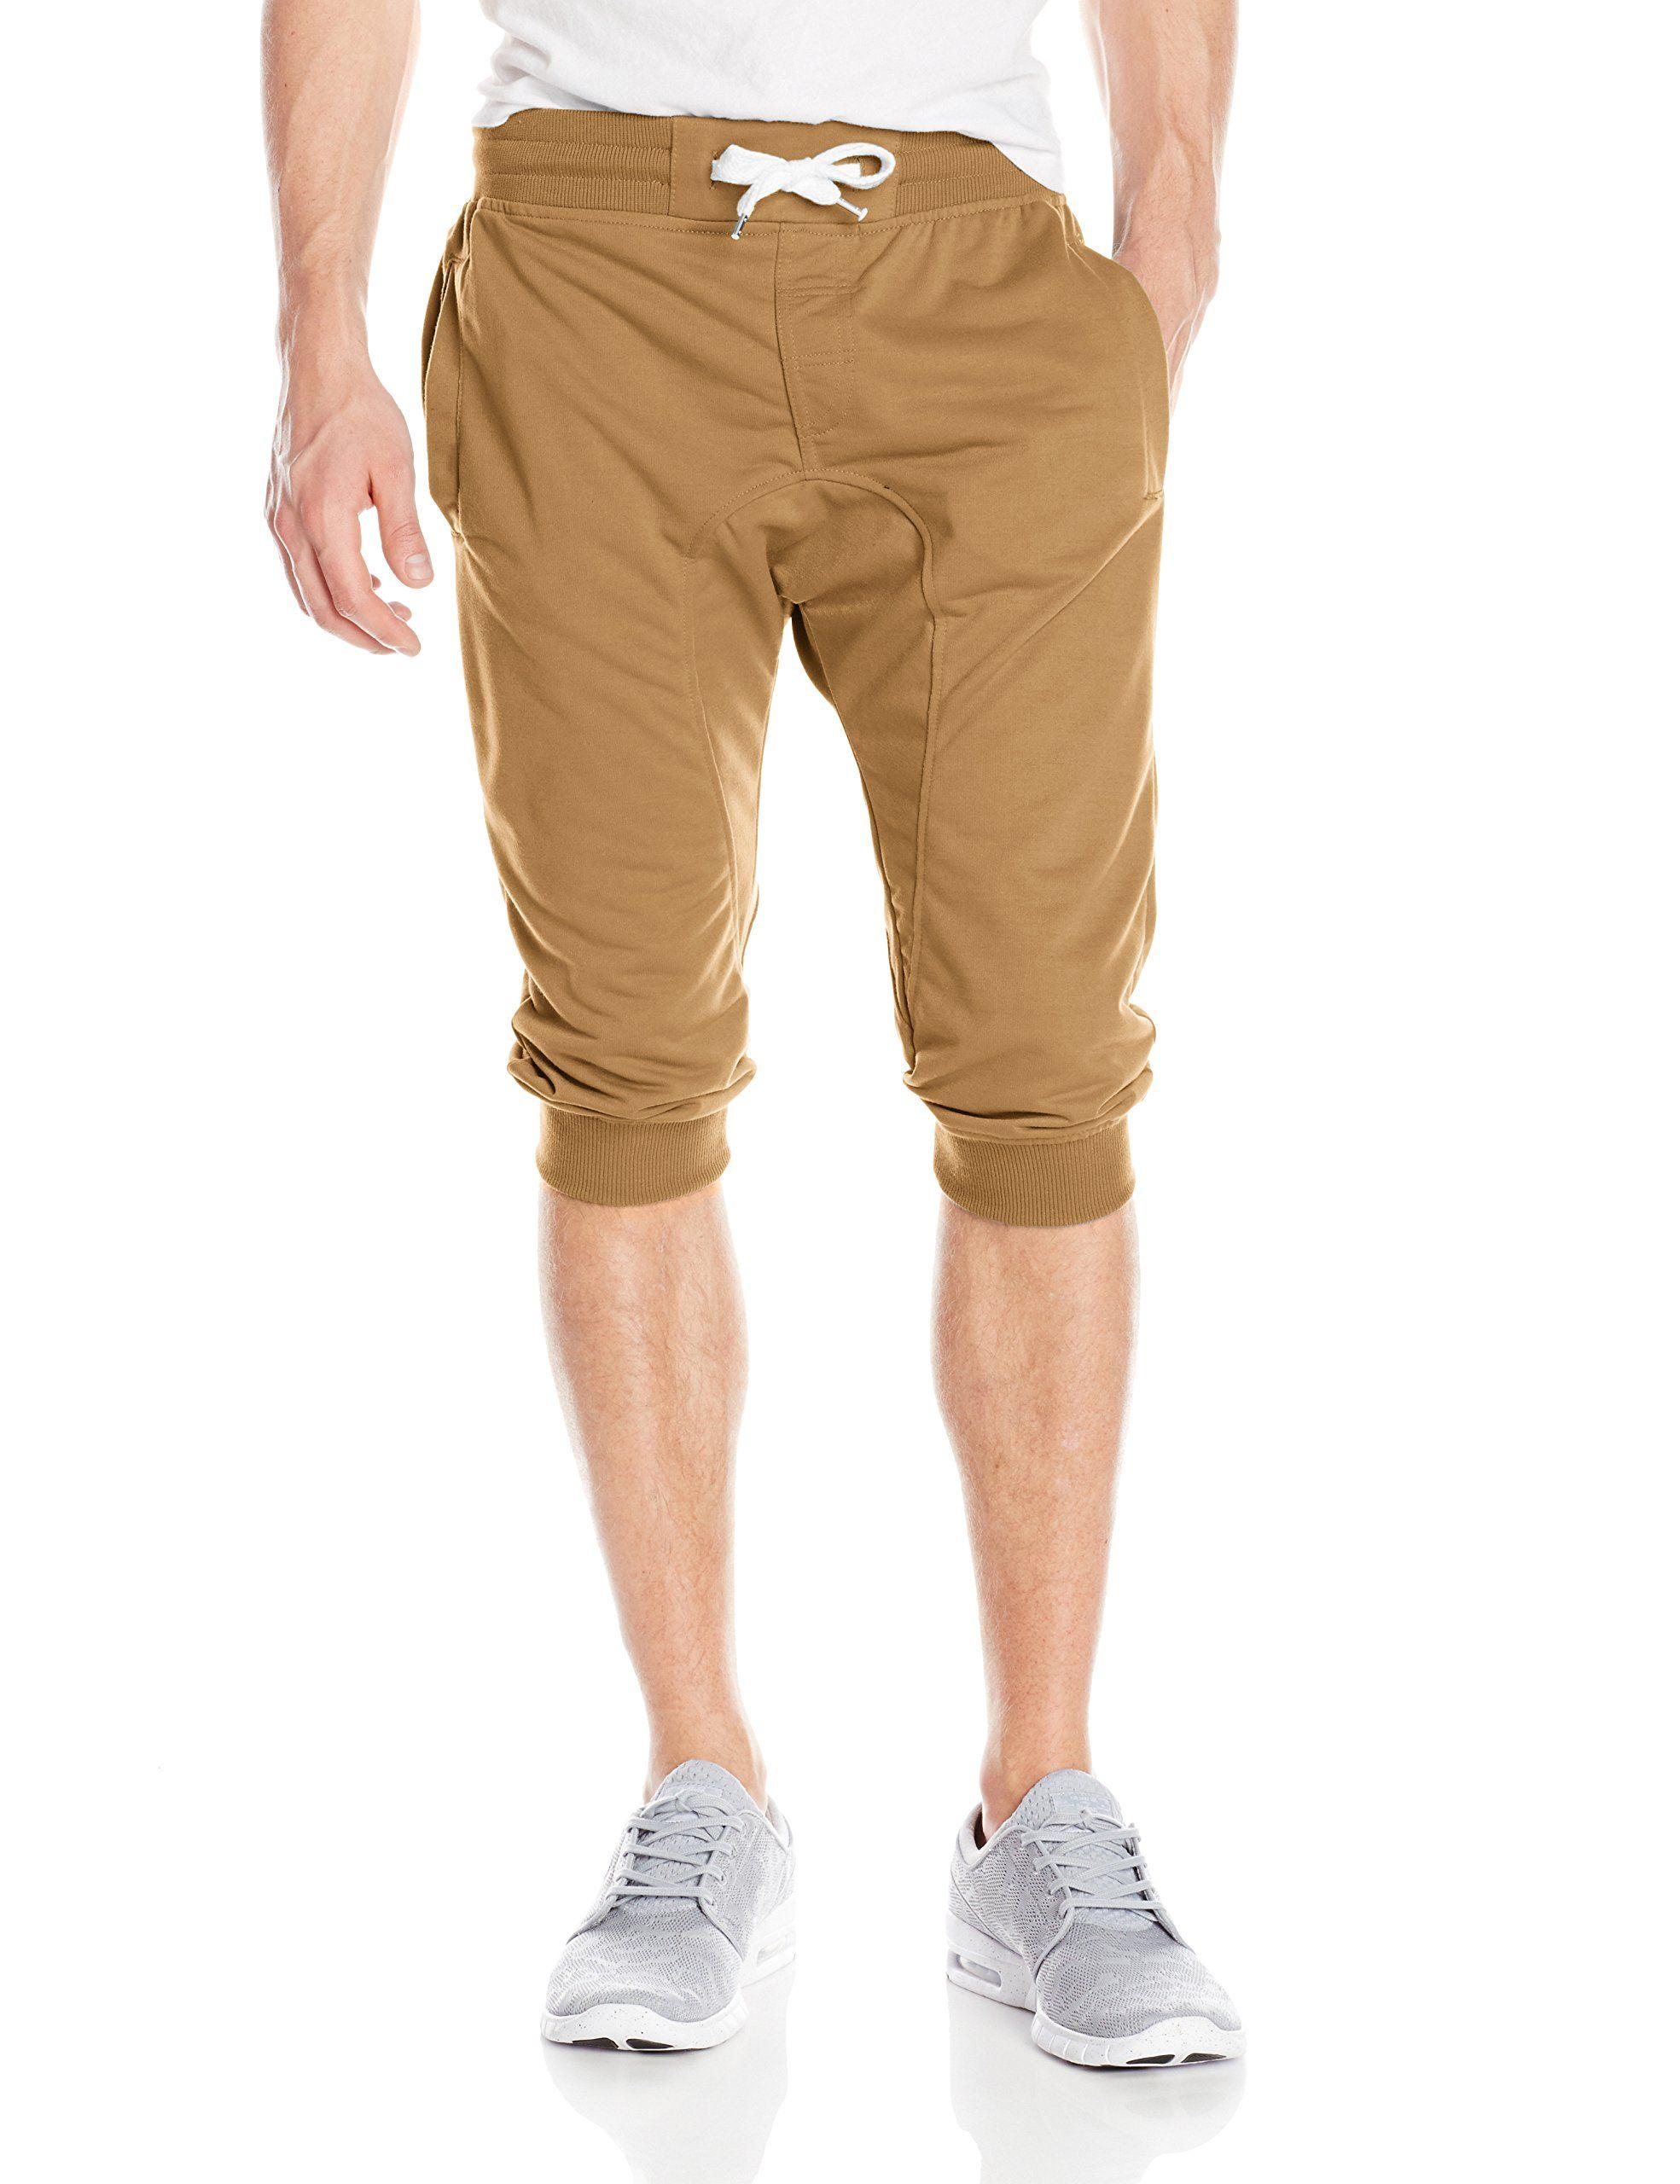 9319c40ed Southpole Men s Jogger Capri Pants Basic Solid Colors In 3 4 Length ...